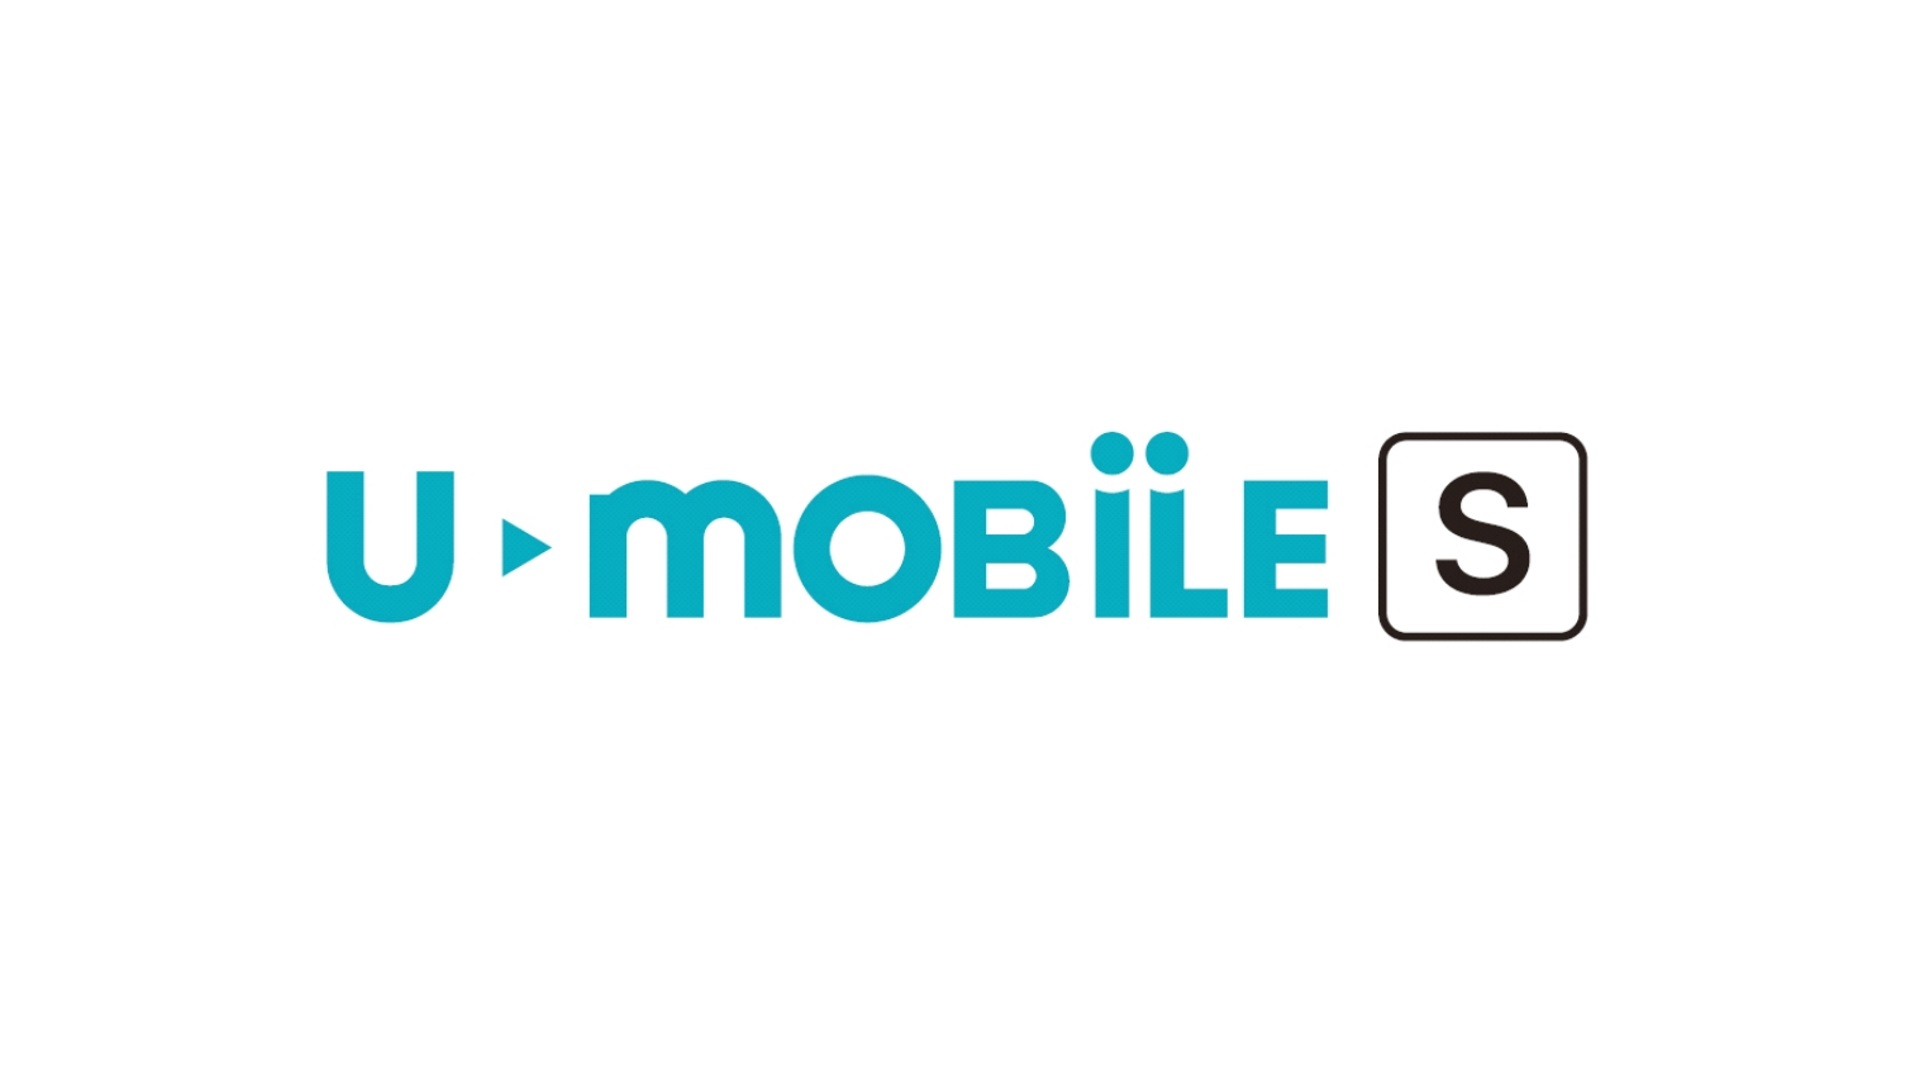 U-NEXT、SIMフリーにも対応するSoftBank回線を利用したMVNOを「U-mobile S」として3月22日より提供